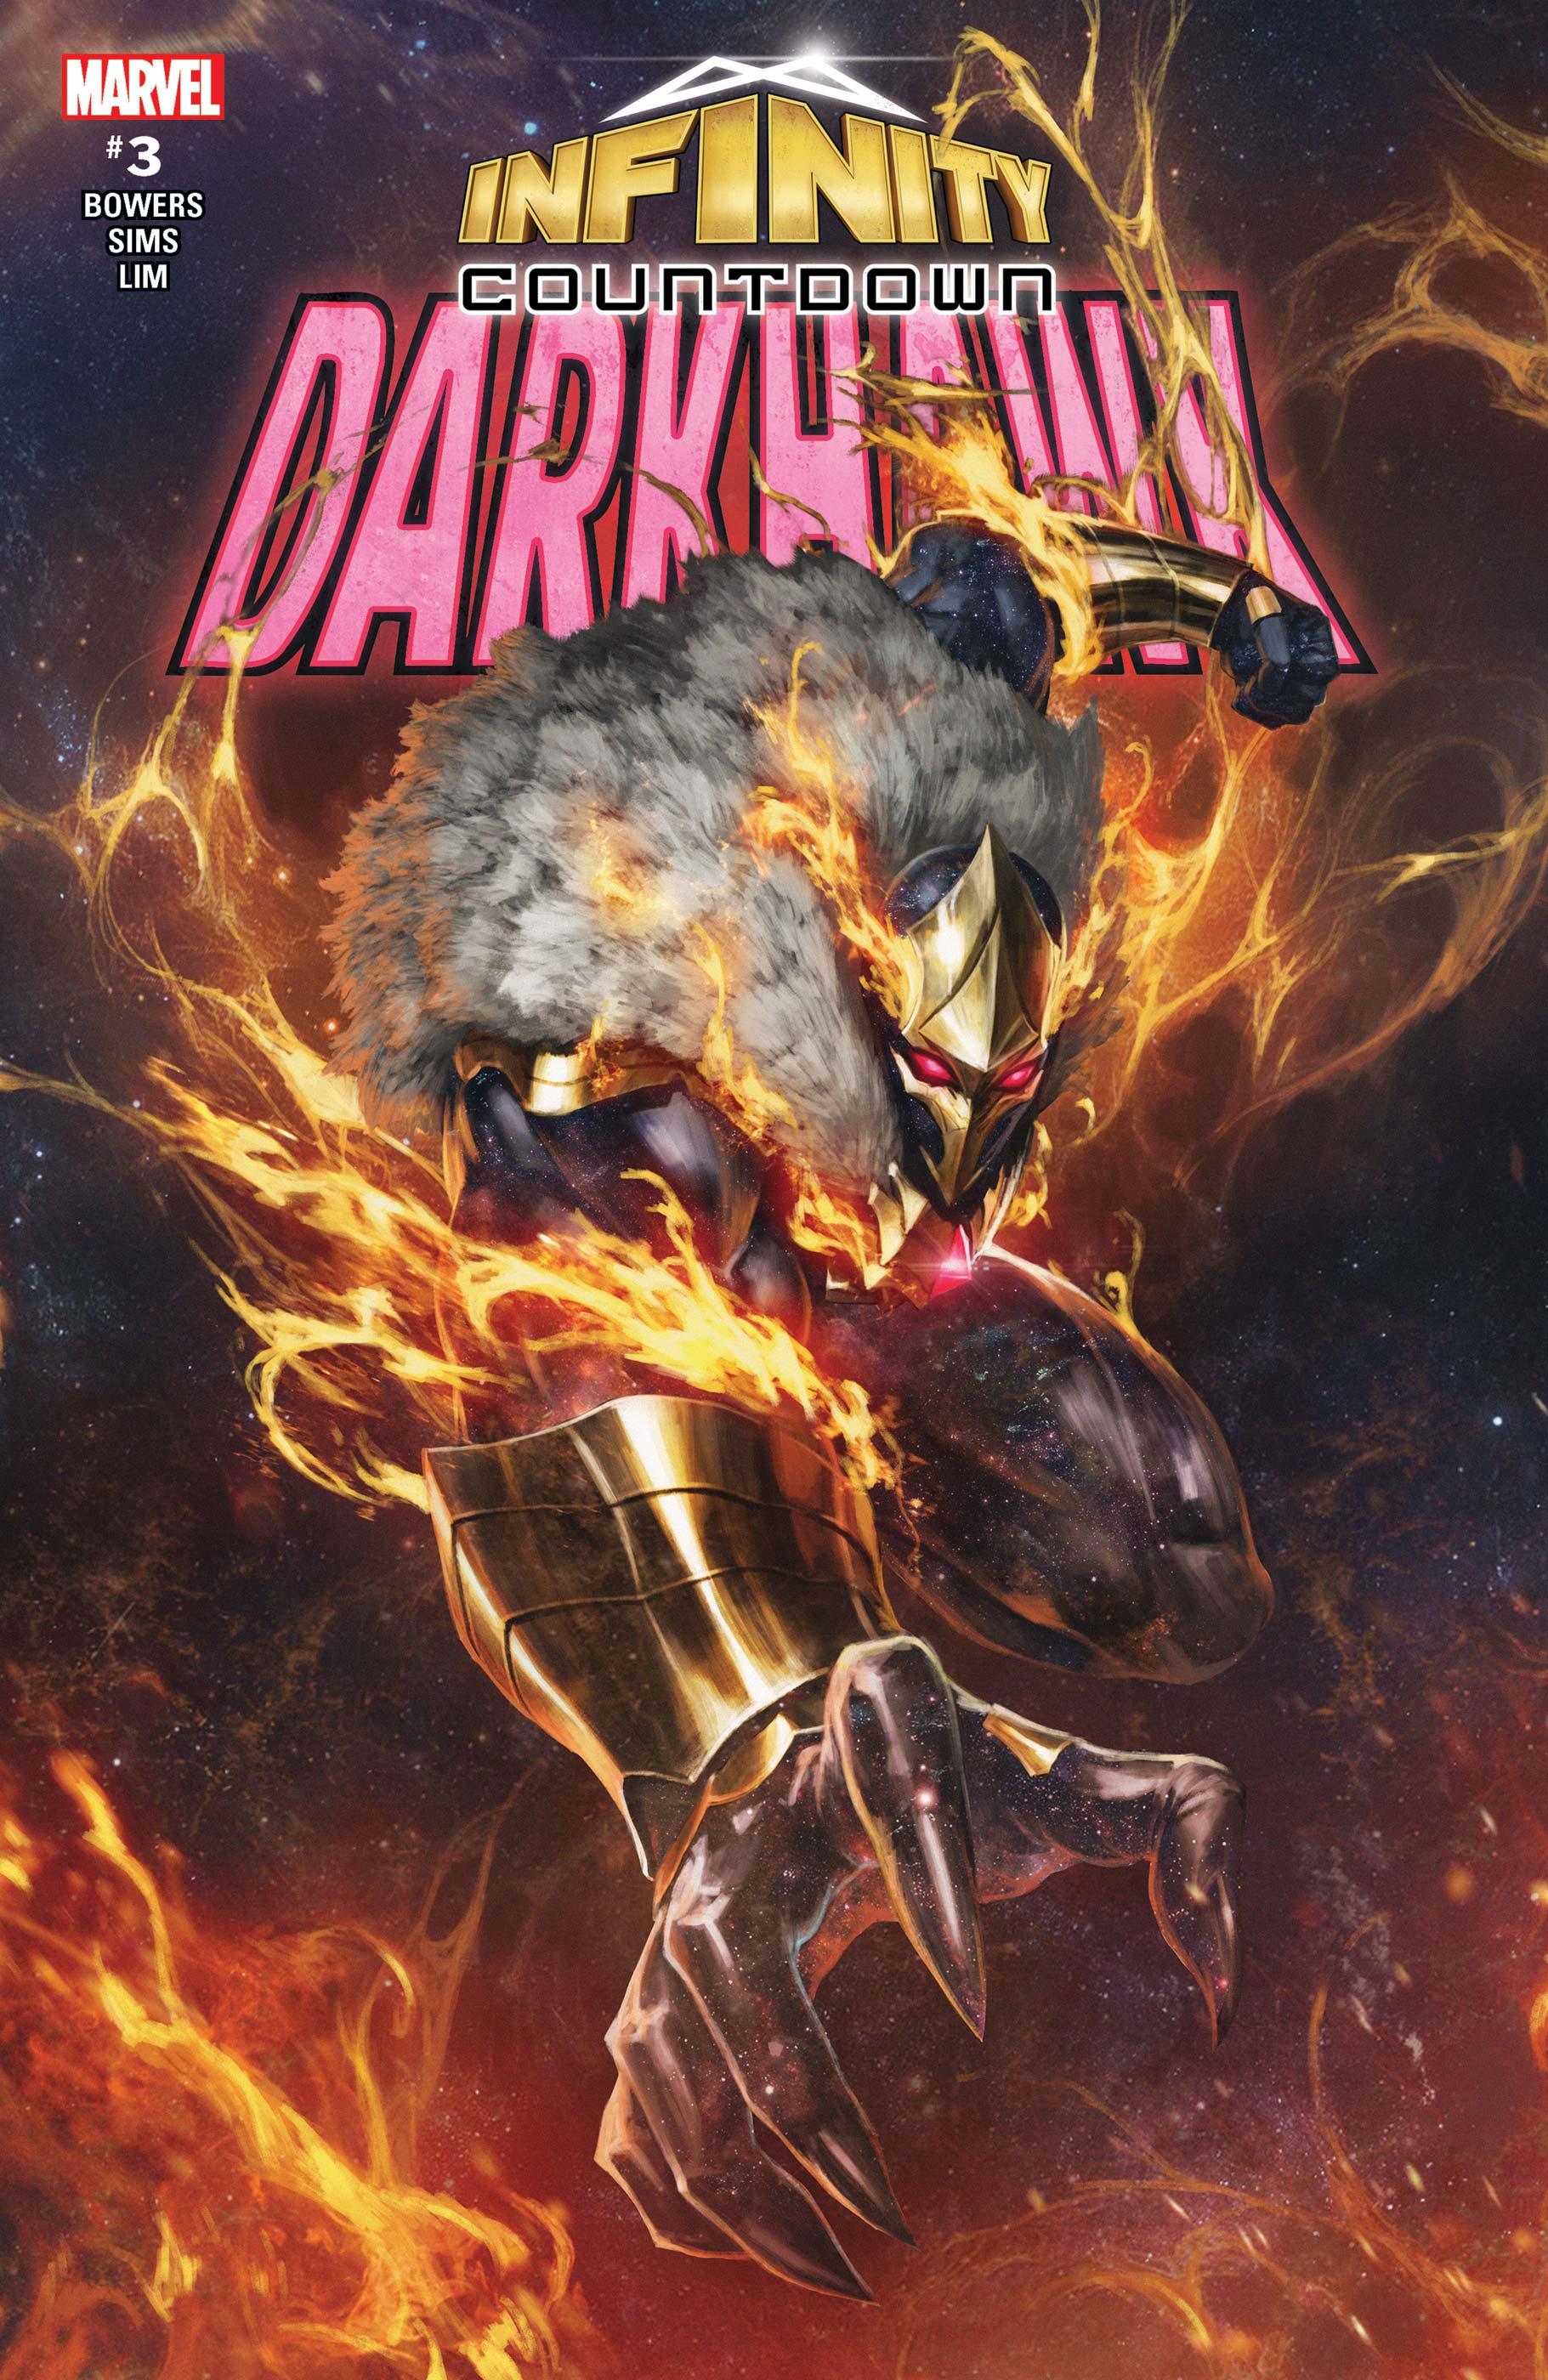 Infinity Countdown: Darkhawk (2018) #3